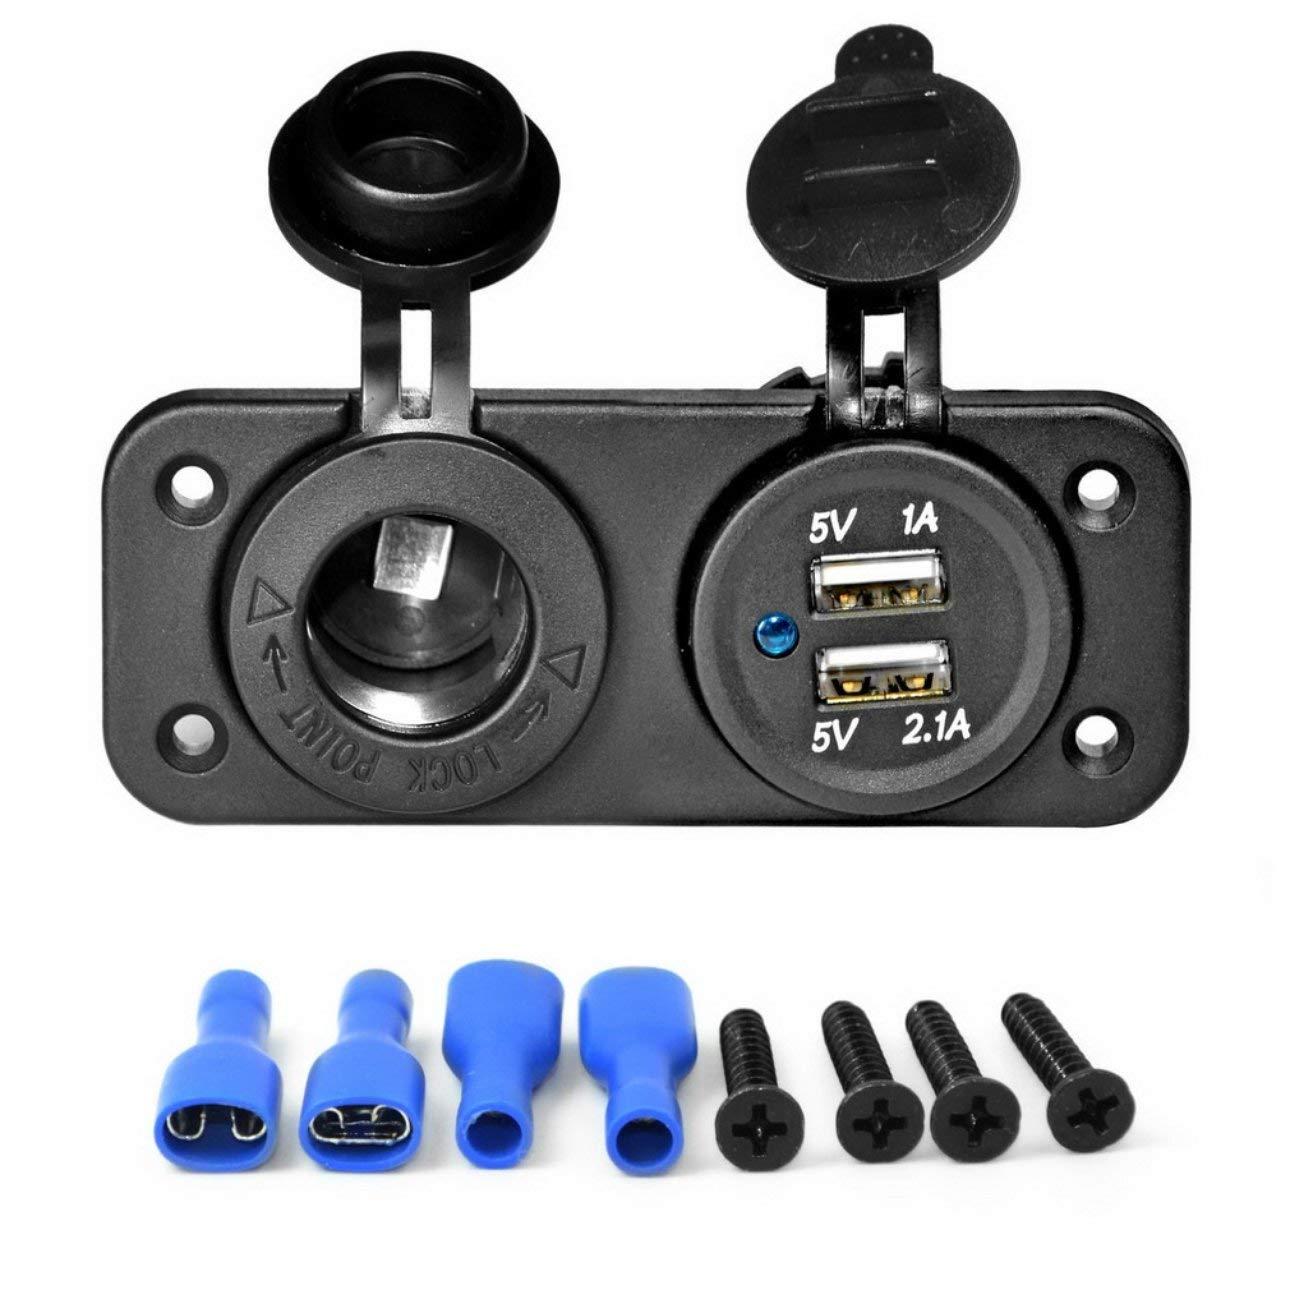 Ballylelly Accesorios para autom/óviles Cargador de Coche con Pantalla Digital USB Dual Encendedor de Cigarrillos port/átil para Coche con Cargador de Coche con Pantalla LED